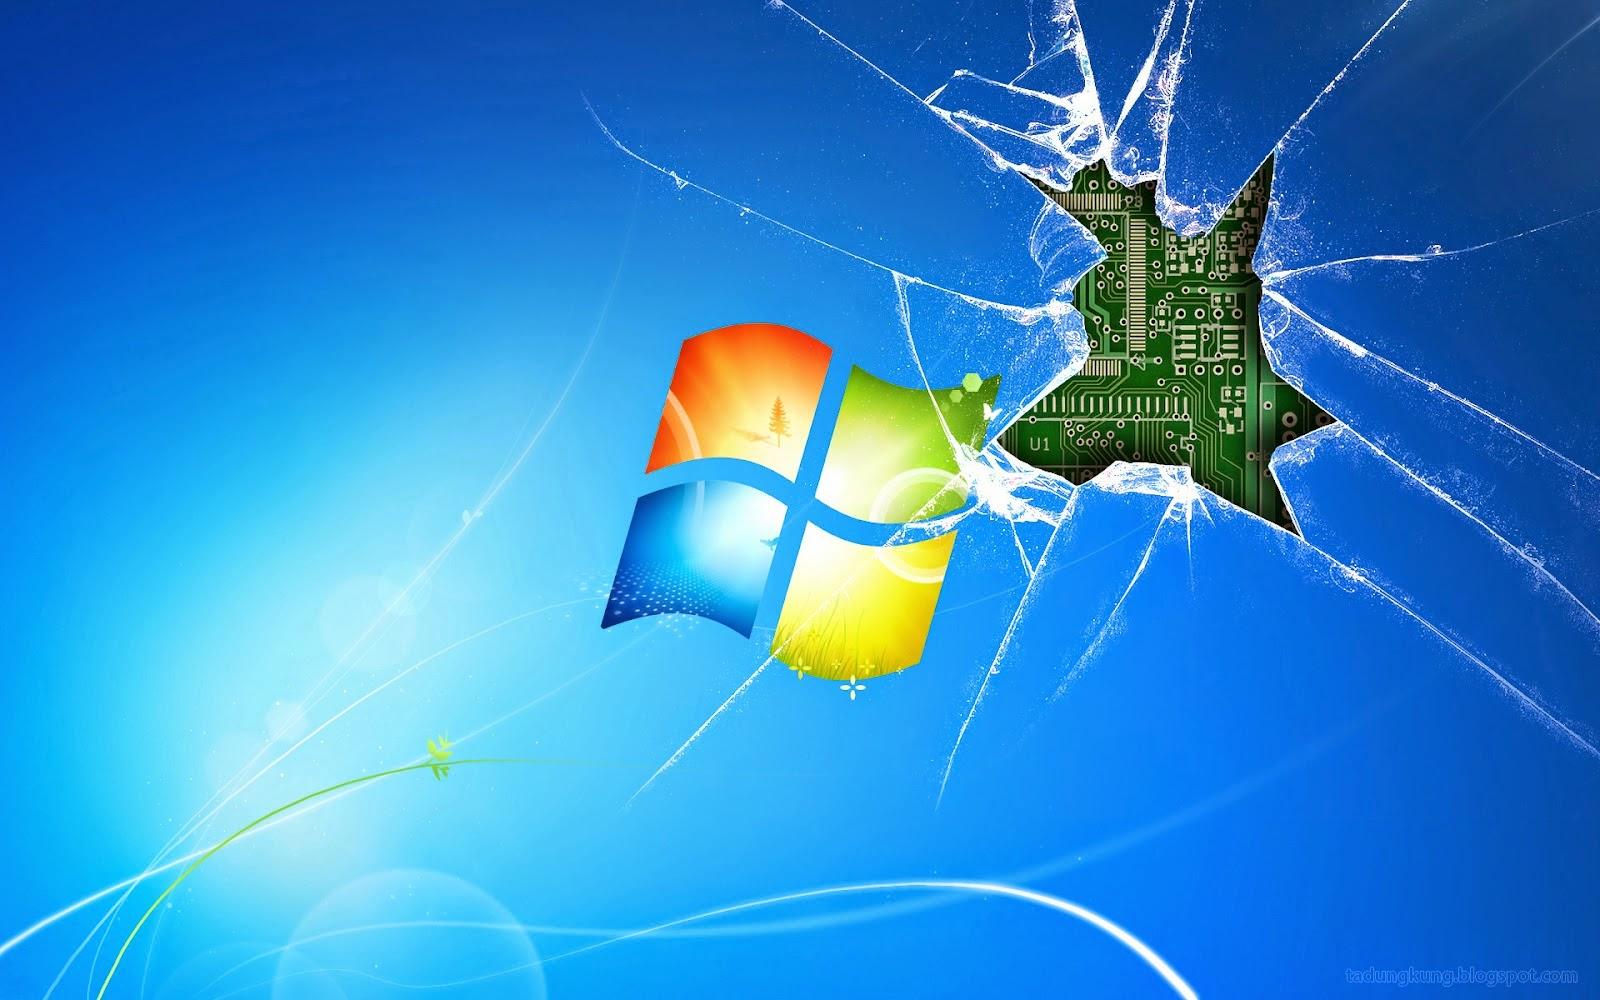 Wallpaper Desktop Bergerak Windows 8 Terlengkap